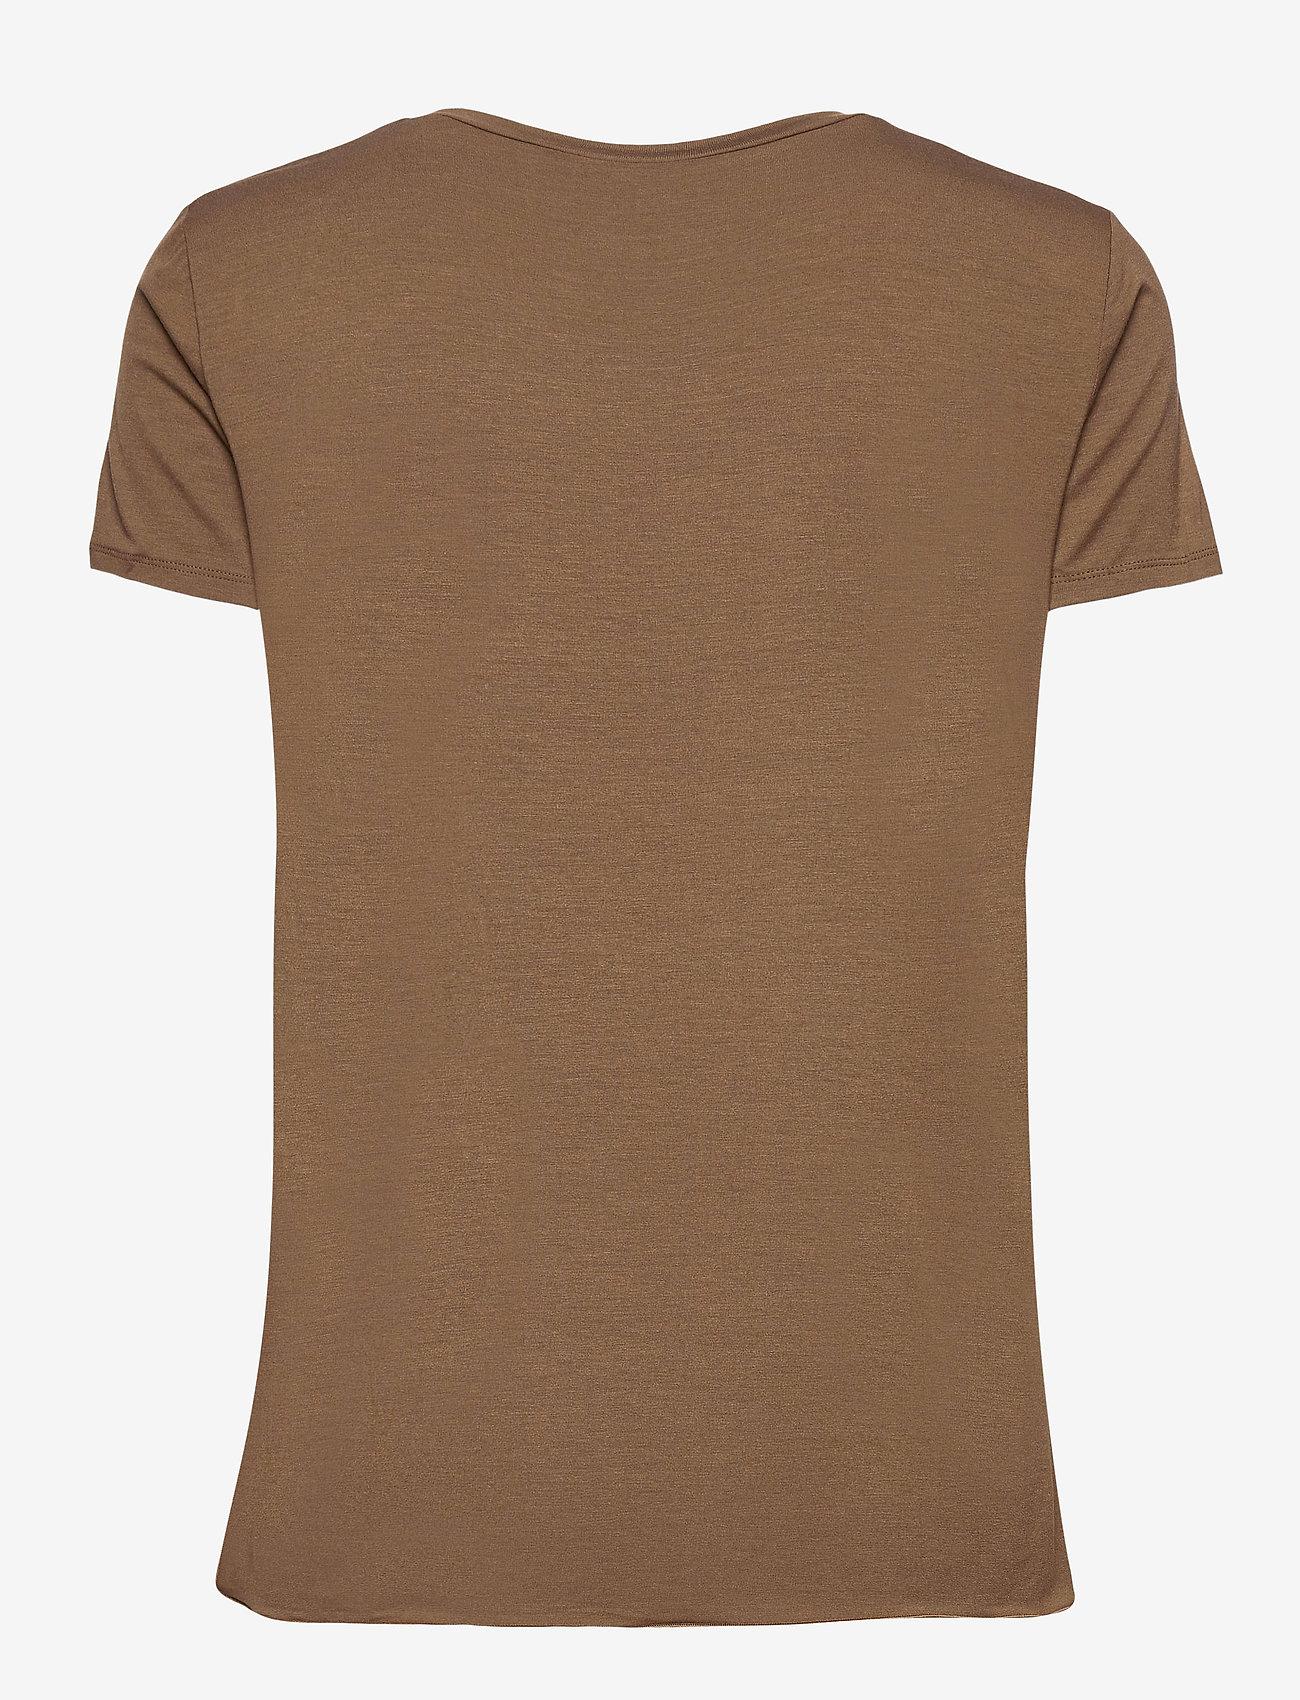 Max Mara Leisure - POSATO - t-shirts - golden green brown - 1